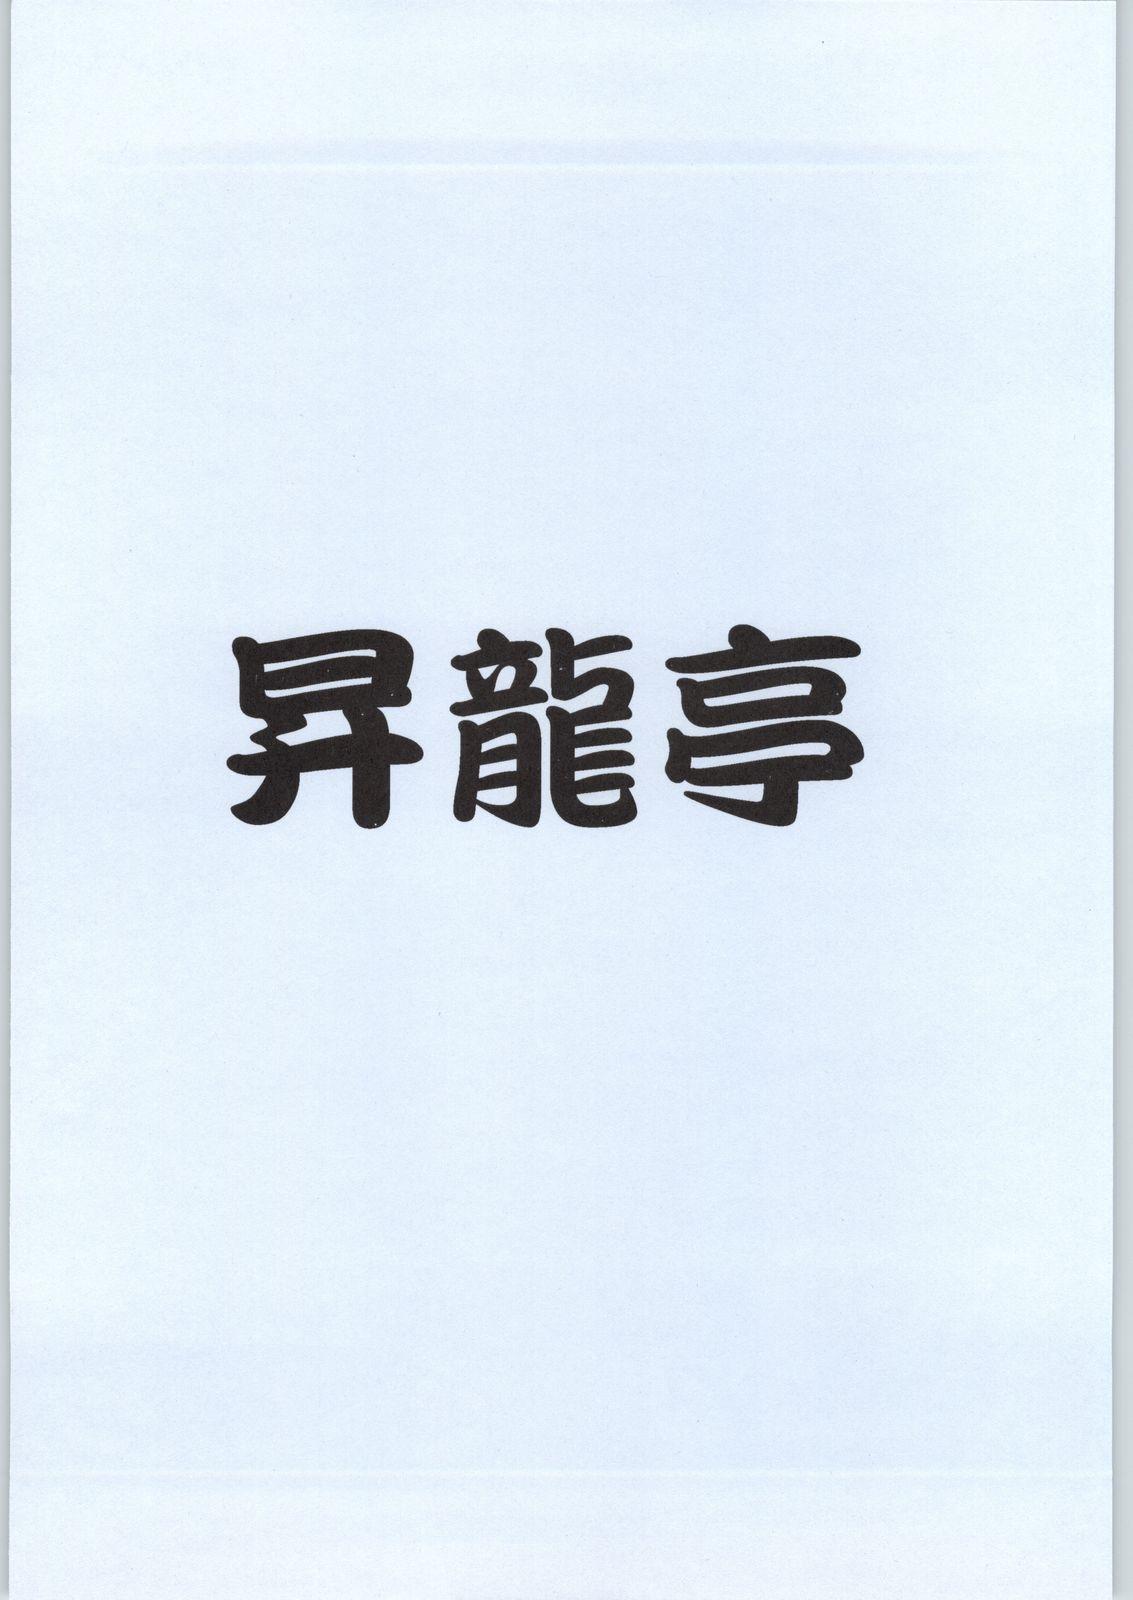 kokoro chou chunli 15